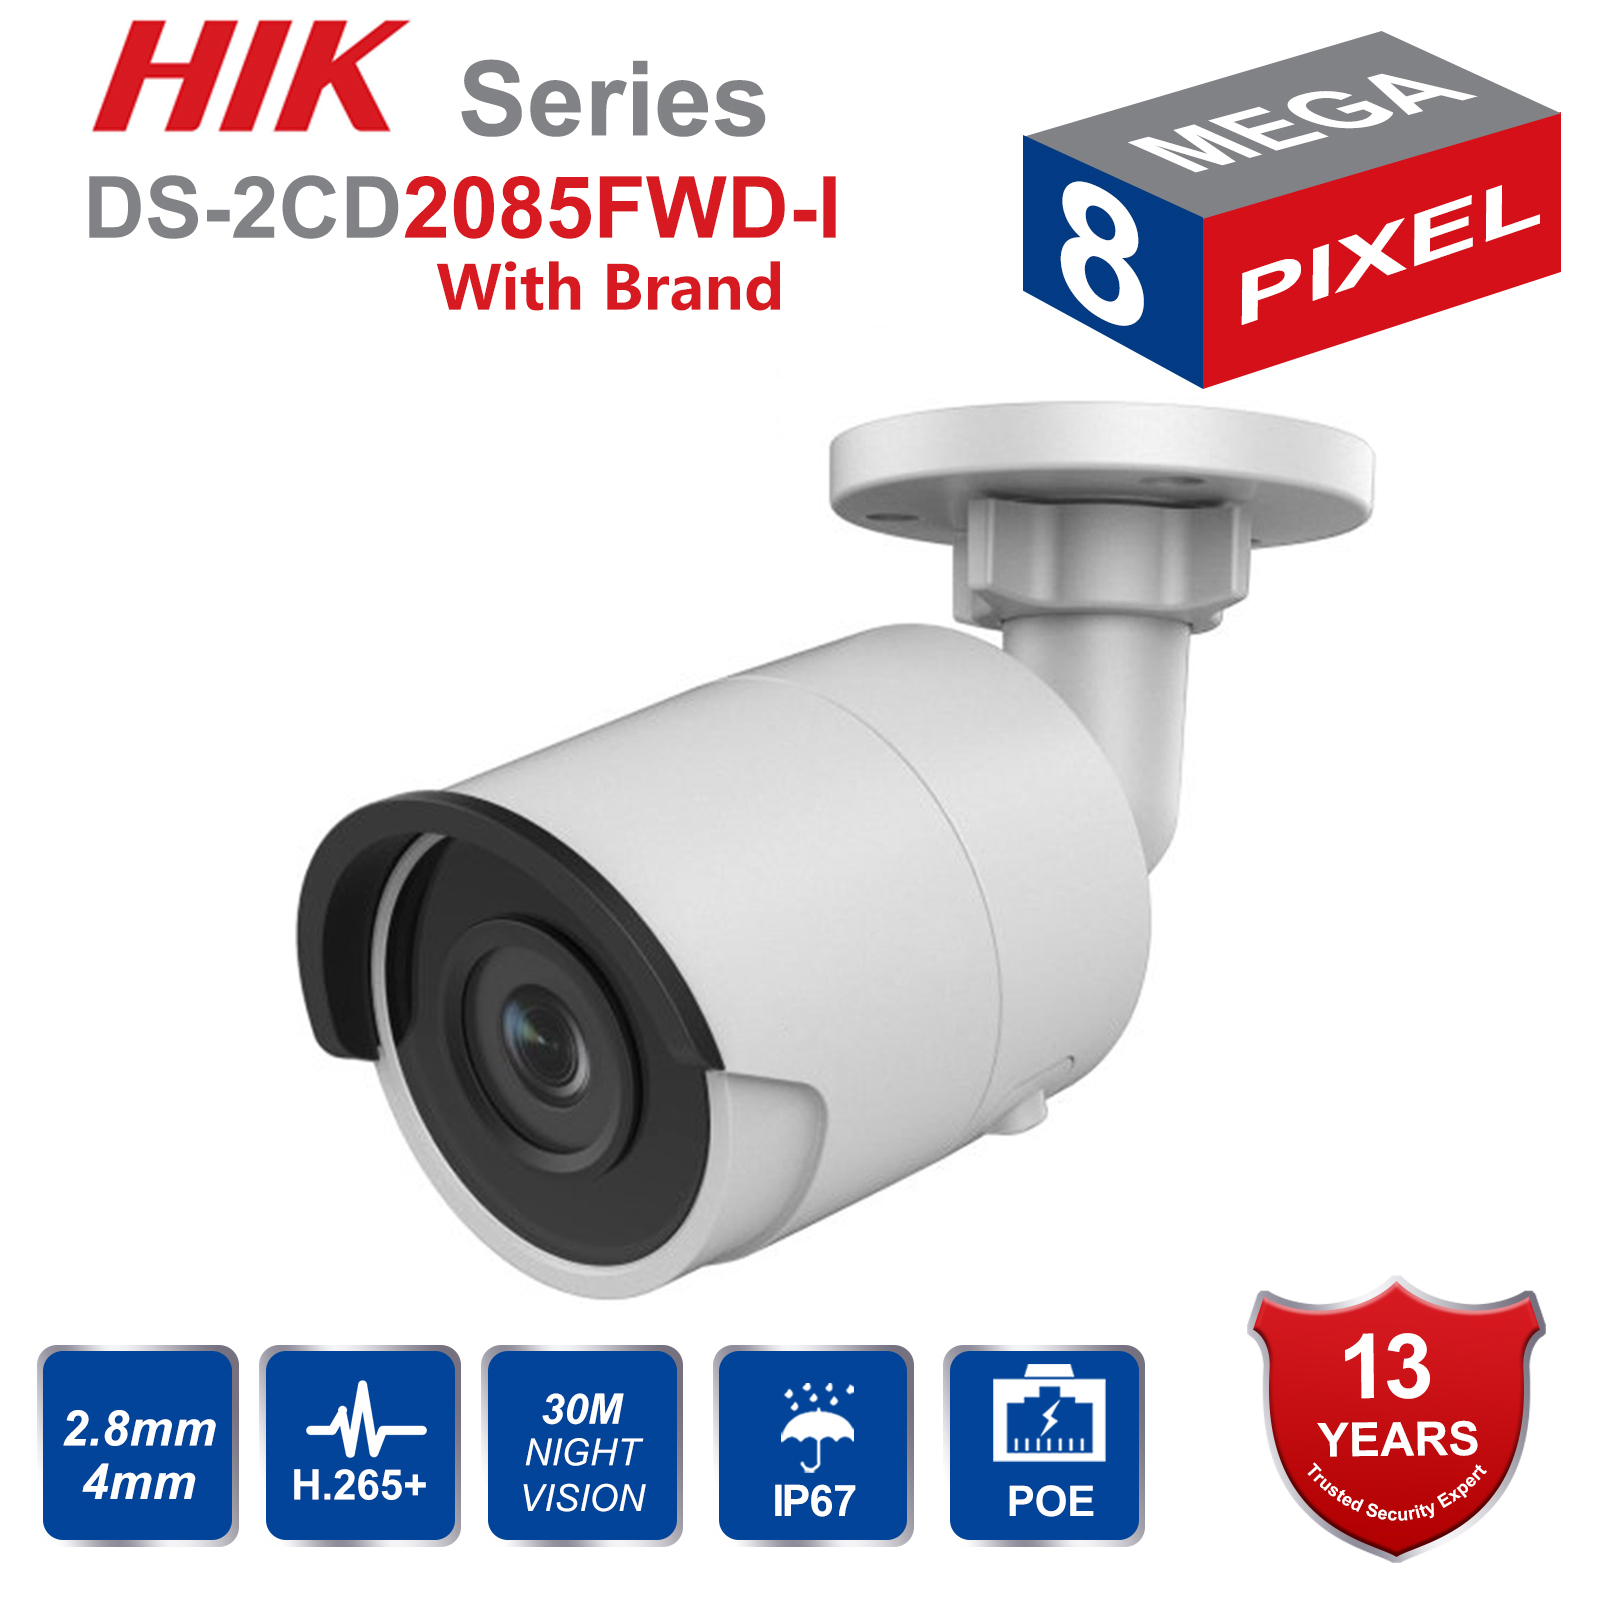 Hik Original 8MP CCTV Camera Updateable DS-2CD2085FWD-I IP Camera High Resoultion WDR POE Bullet CCTV Camera With SD Card Slot